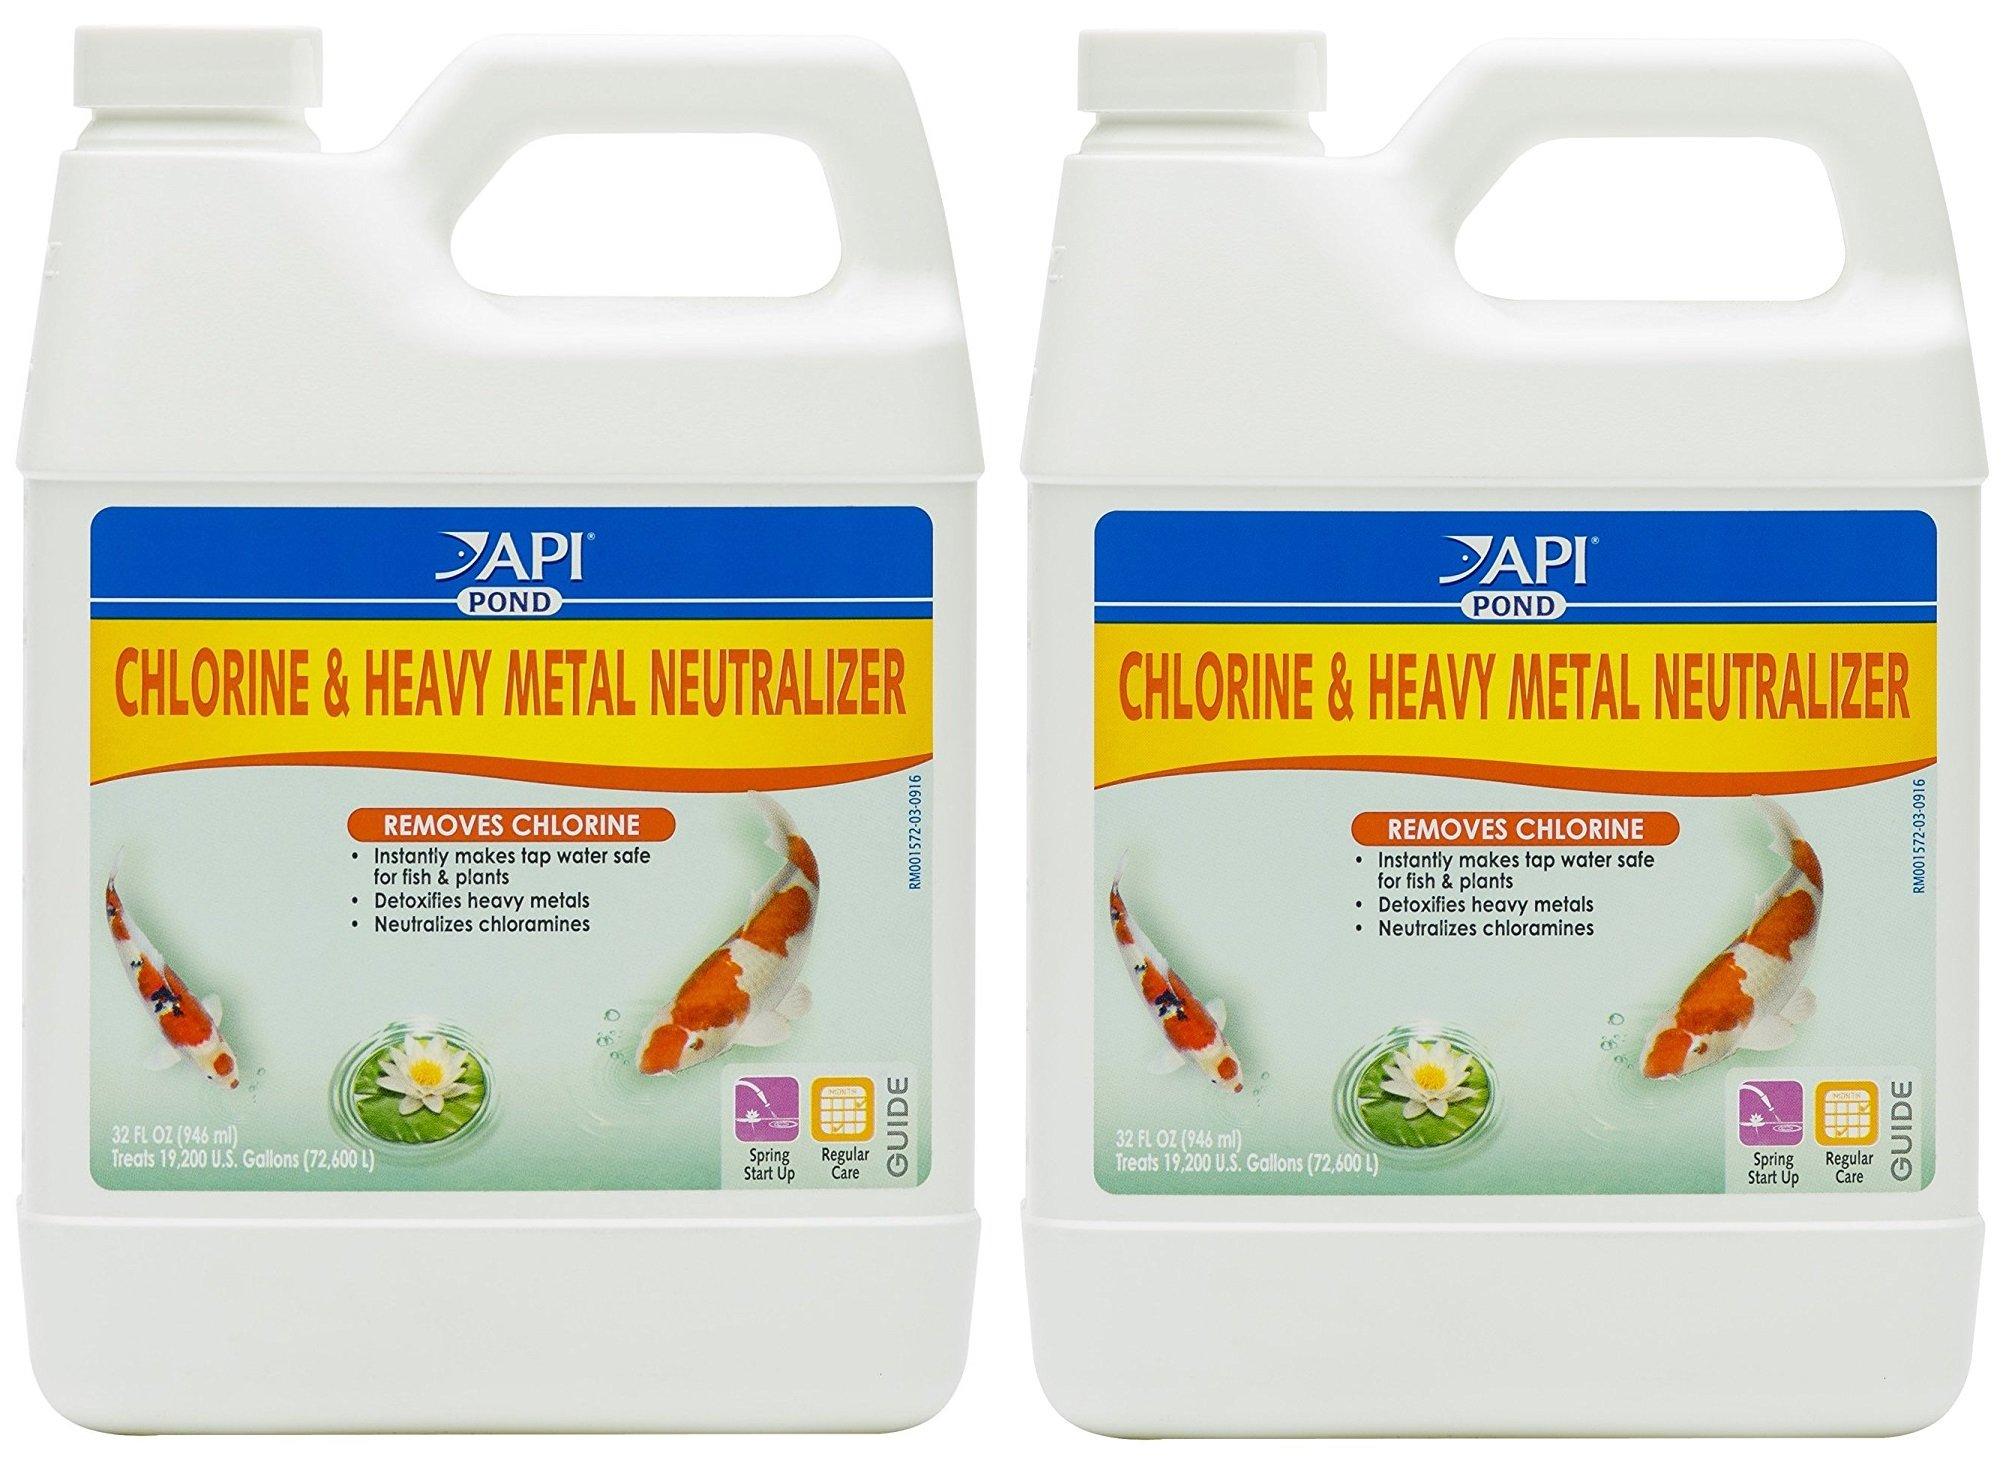 API pond (2 Pack) Mars Fishcare Pondcare Chlorine and Heavy Metal Neutralizer 32 Ounce by API pond